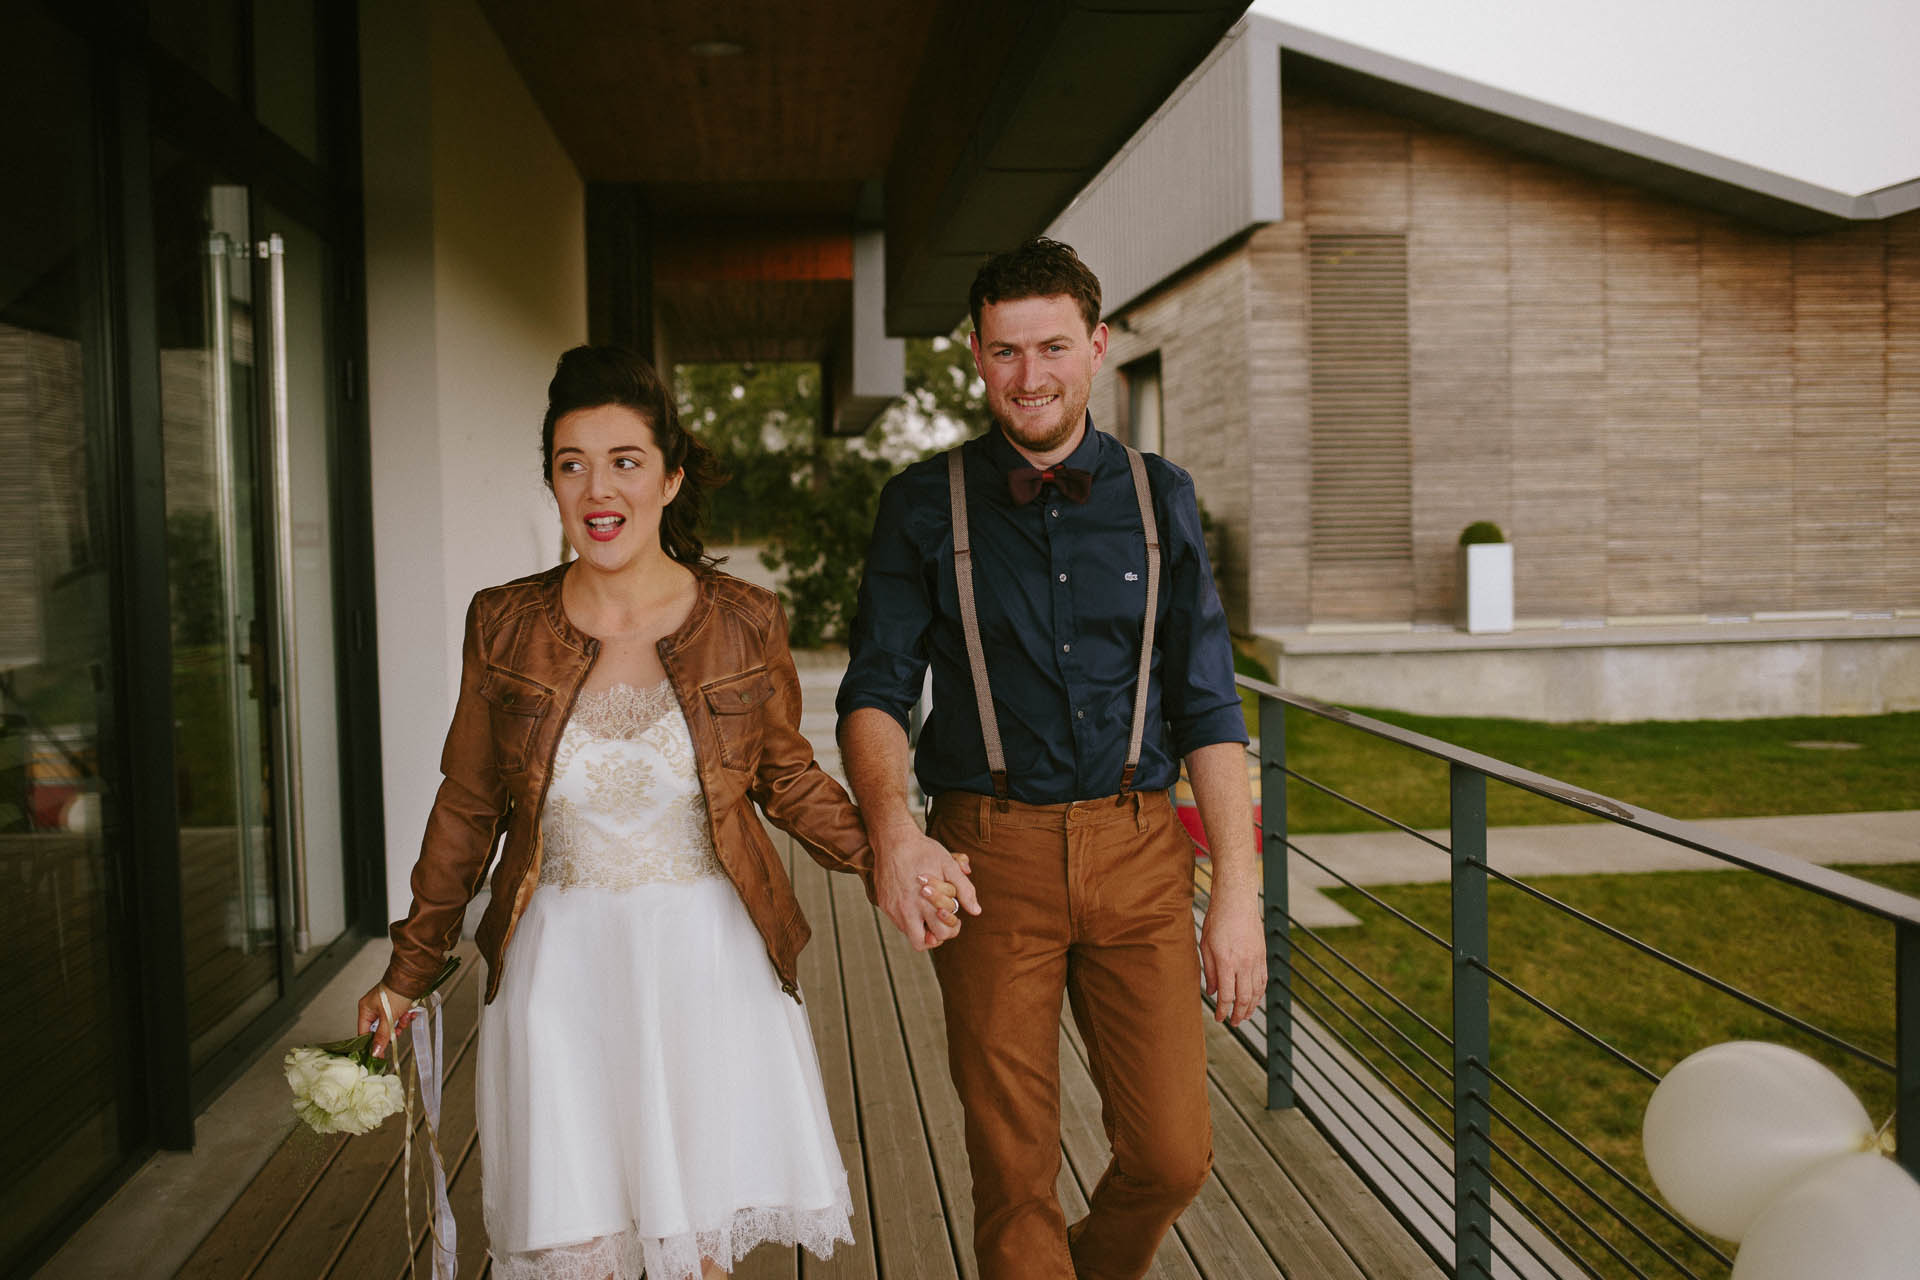 mariage_vignobles_mourat_vendee_jeremy_agathe_flavie_nelly-149